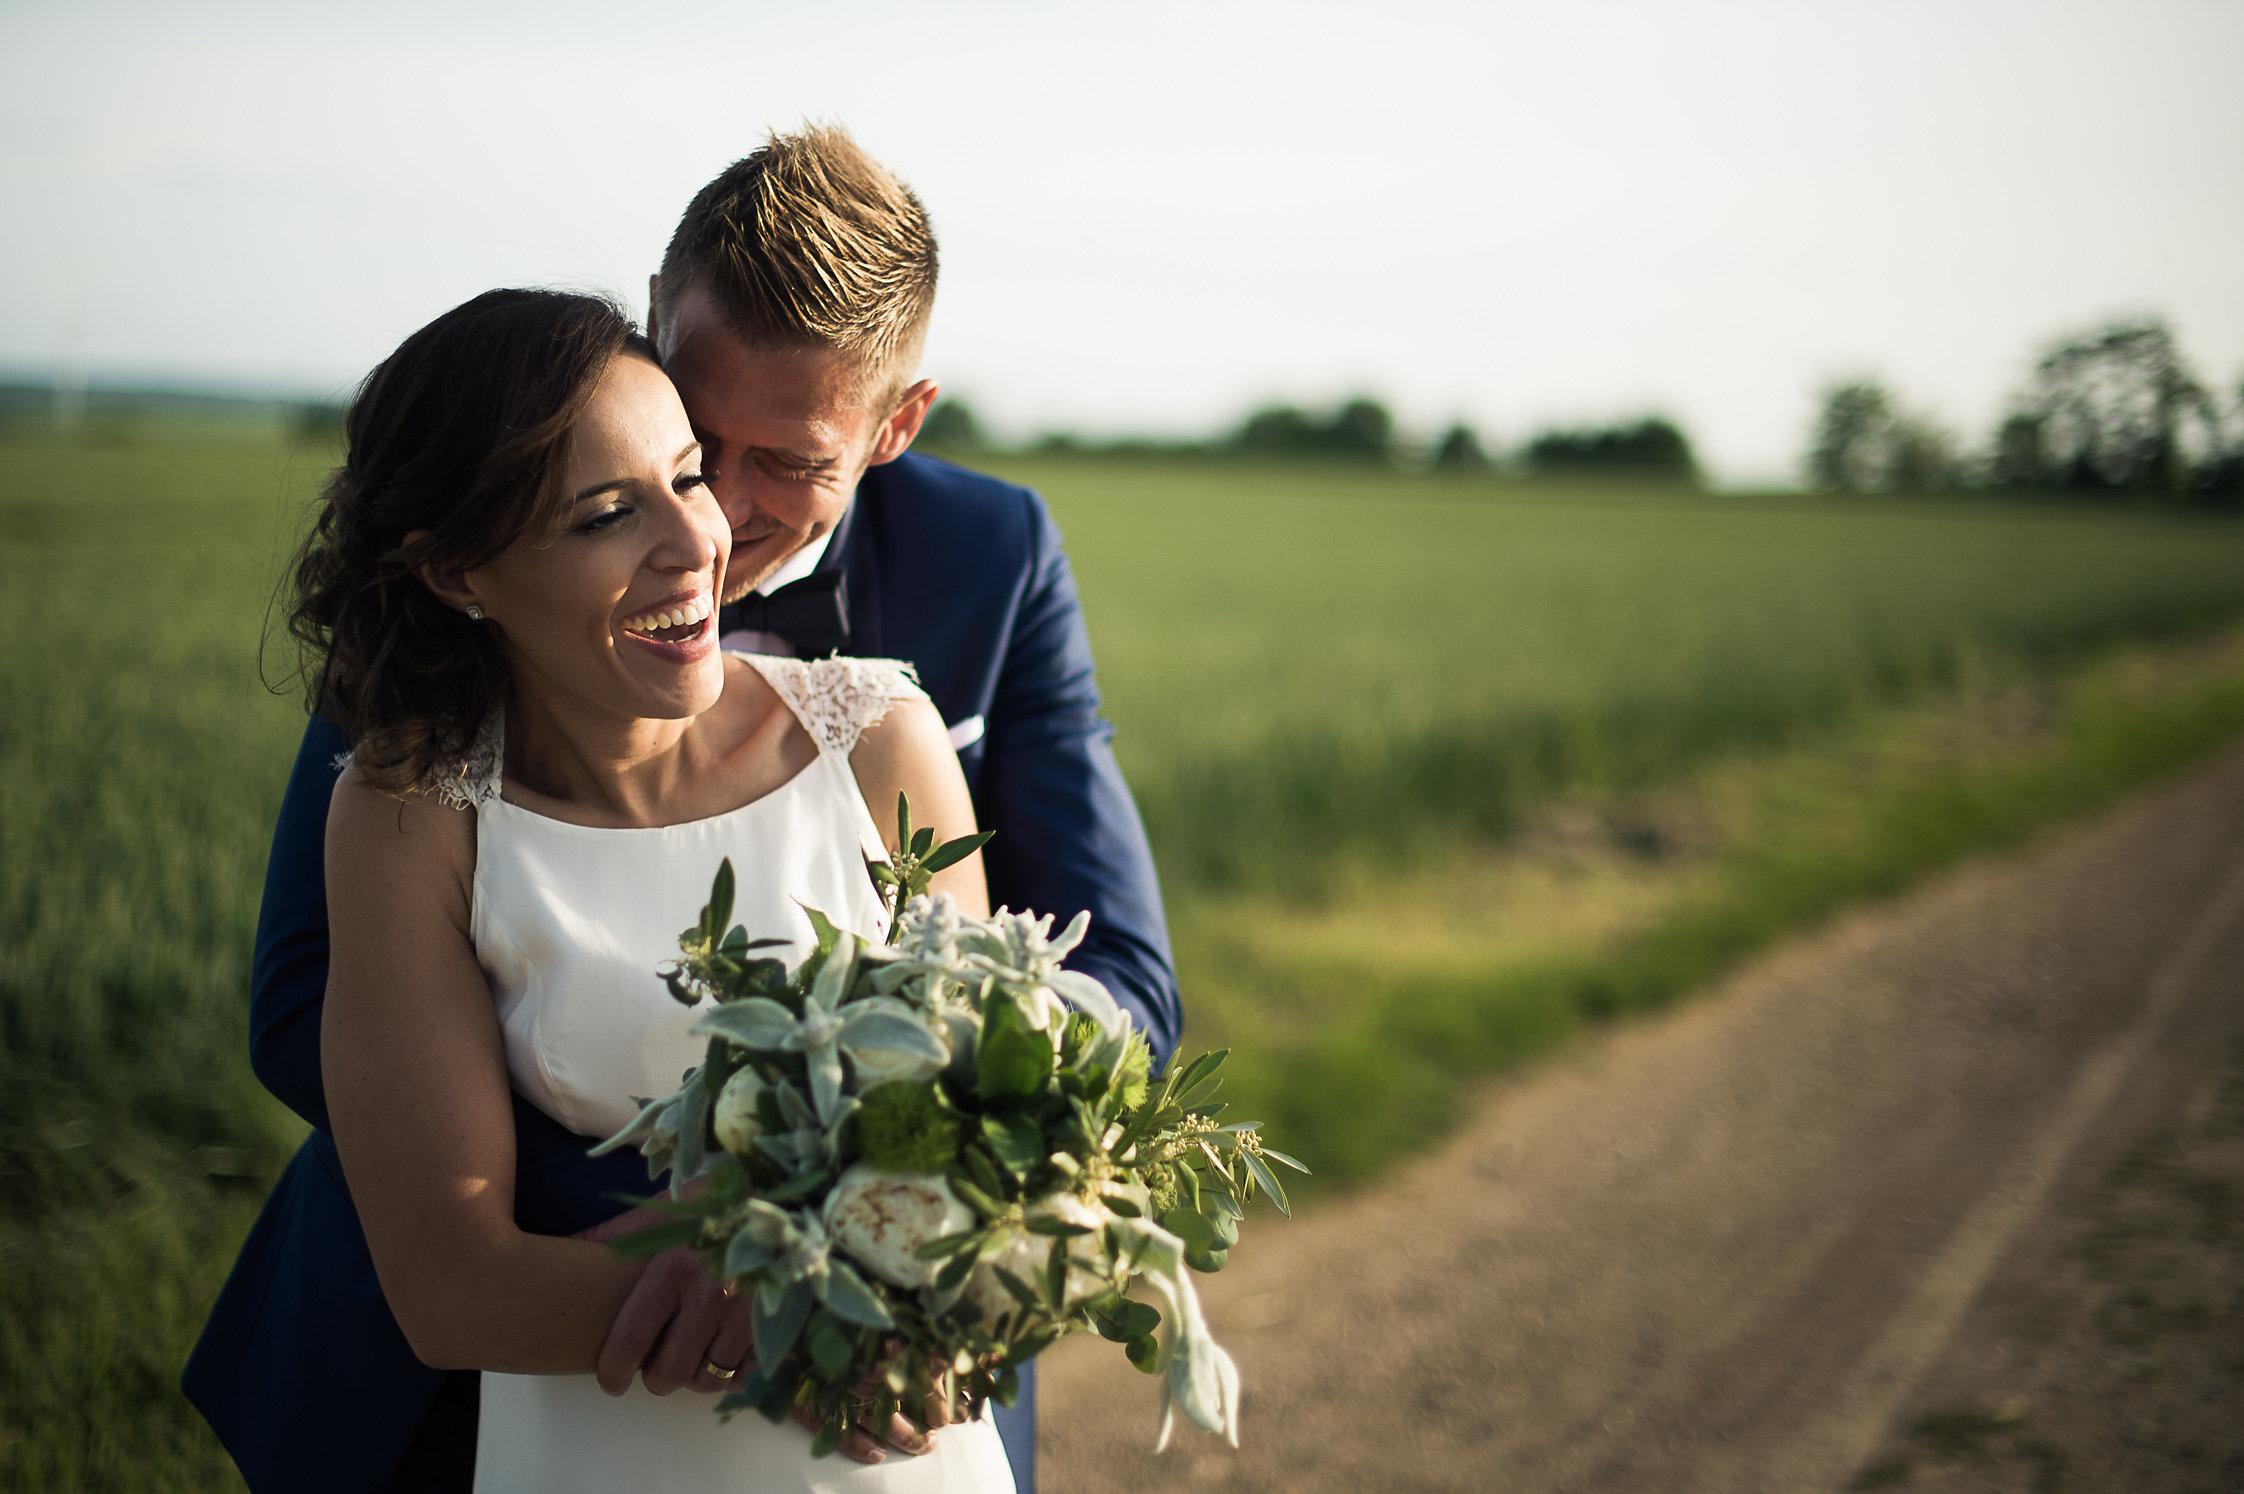 Mariage végétal - Mariage en Picardie - Mariage Granges du Bel Air - Mariage Amiens - Mariage chic - Mariage vert blanc doré - Les crâneuses - Wedding planner - Wedding designer